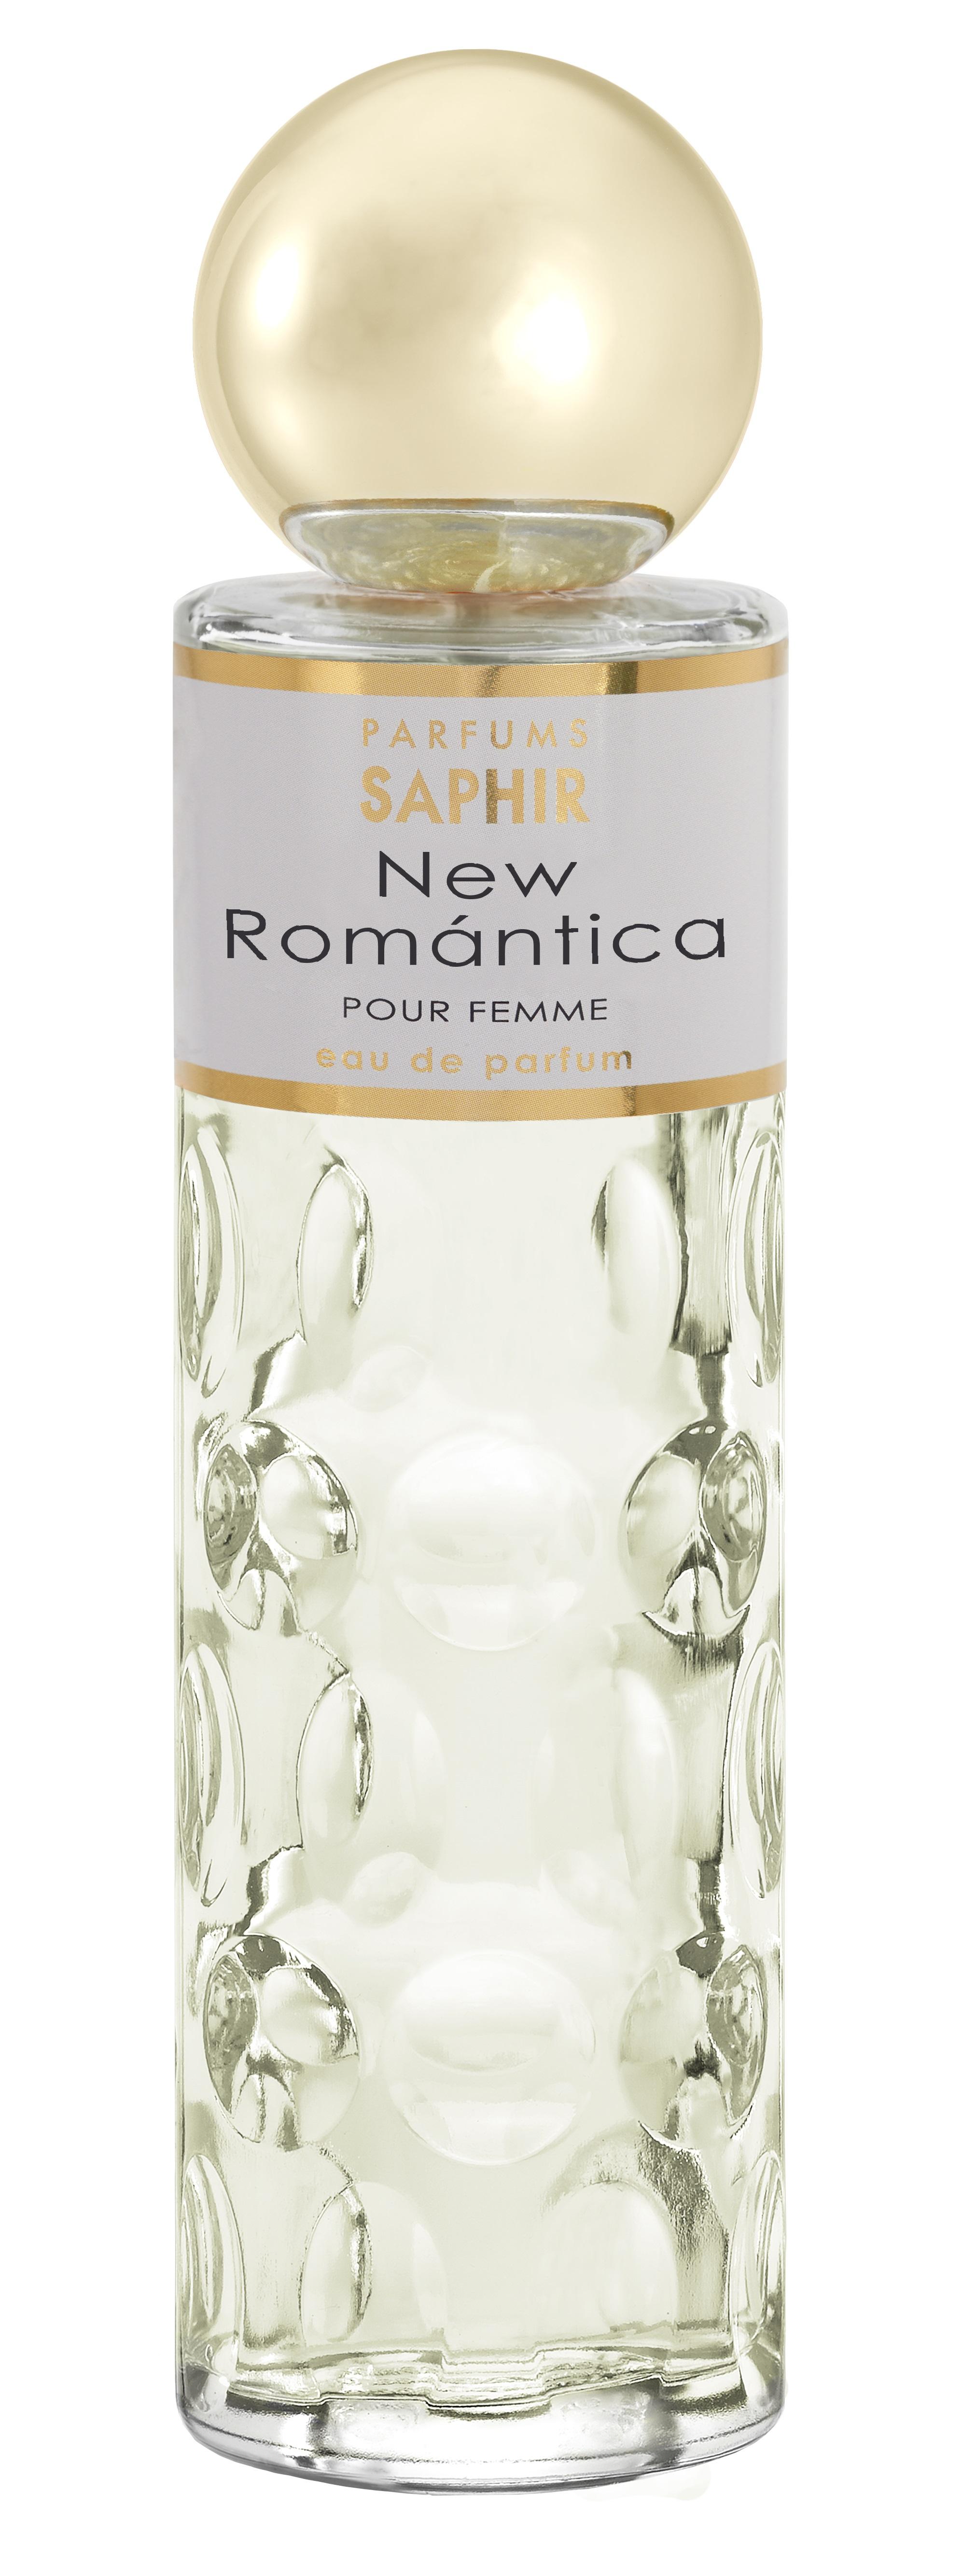 Saphir Romantica Eau de Parfum 200 ml